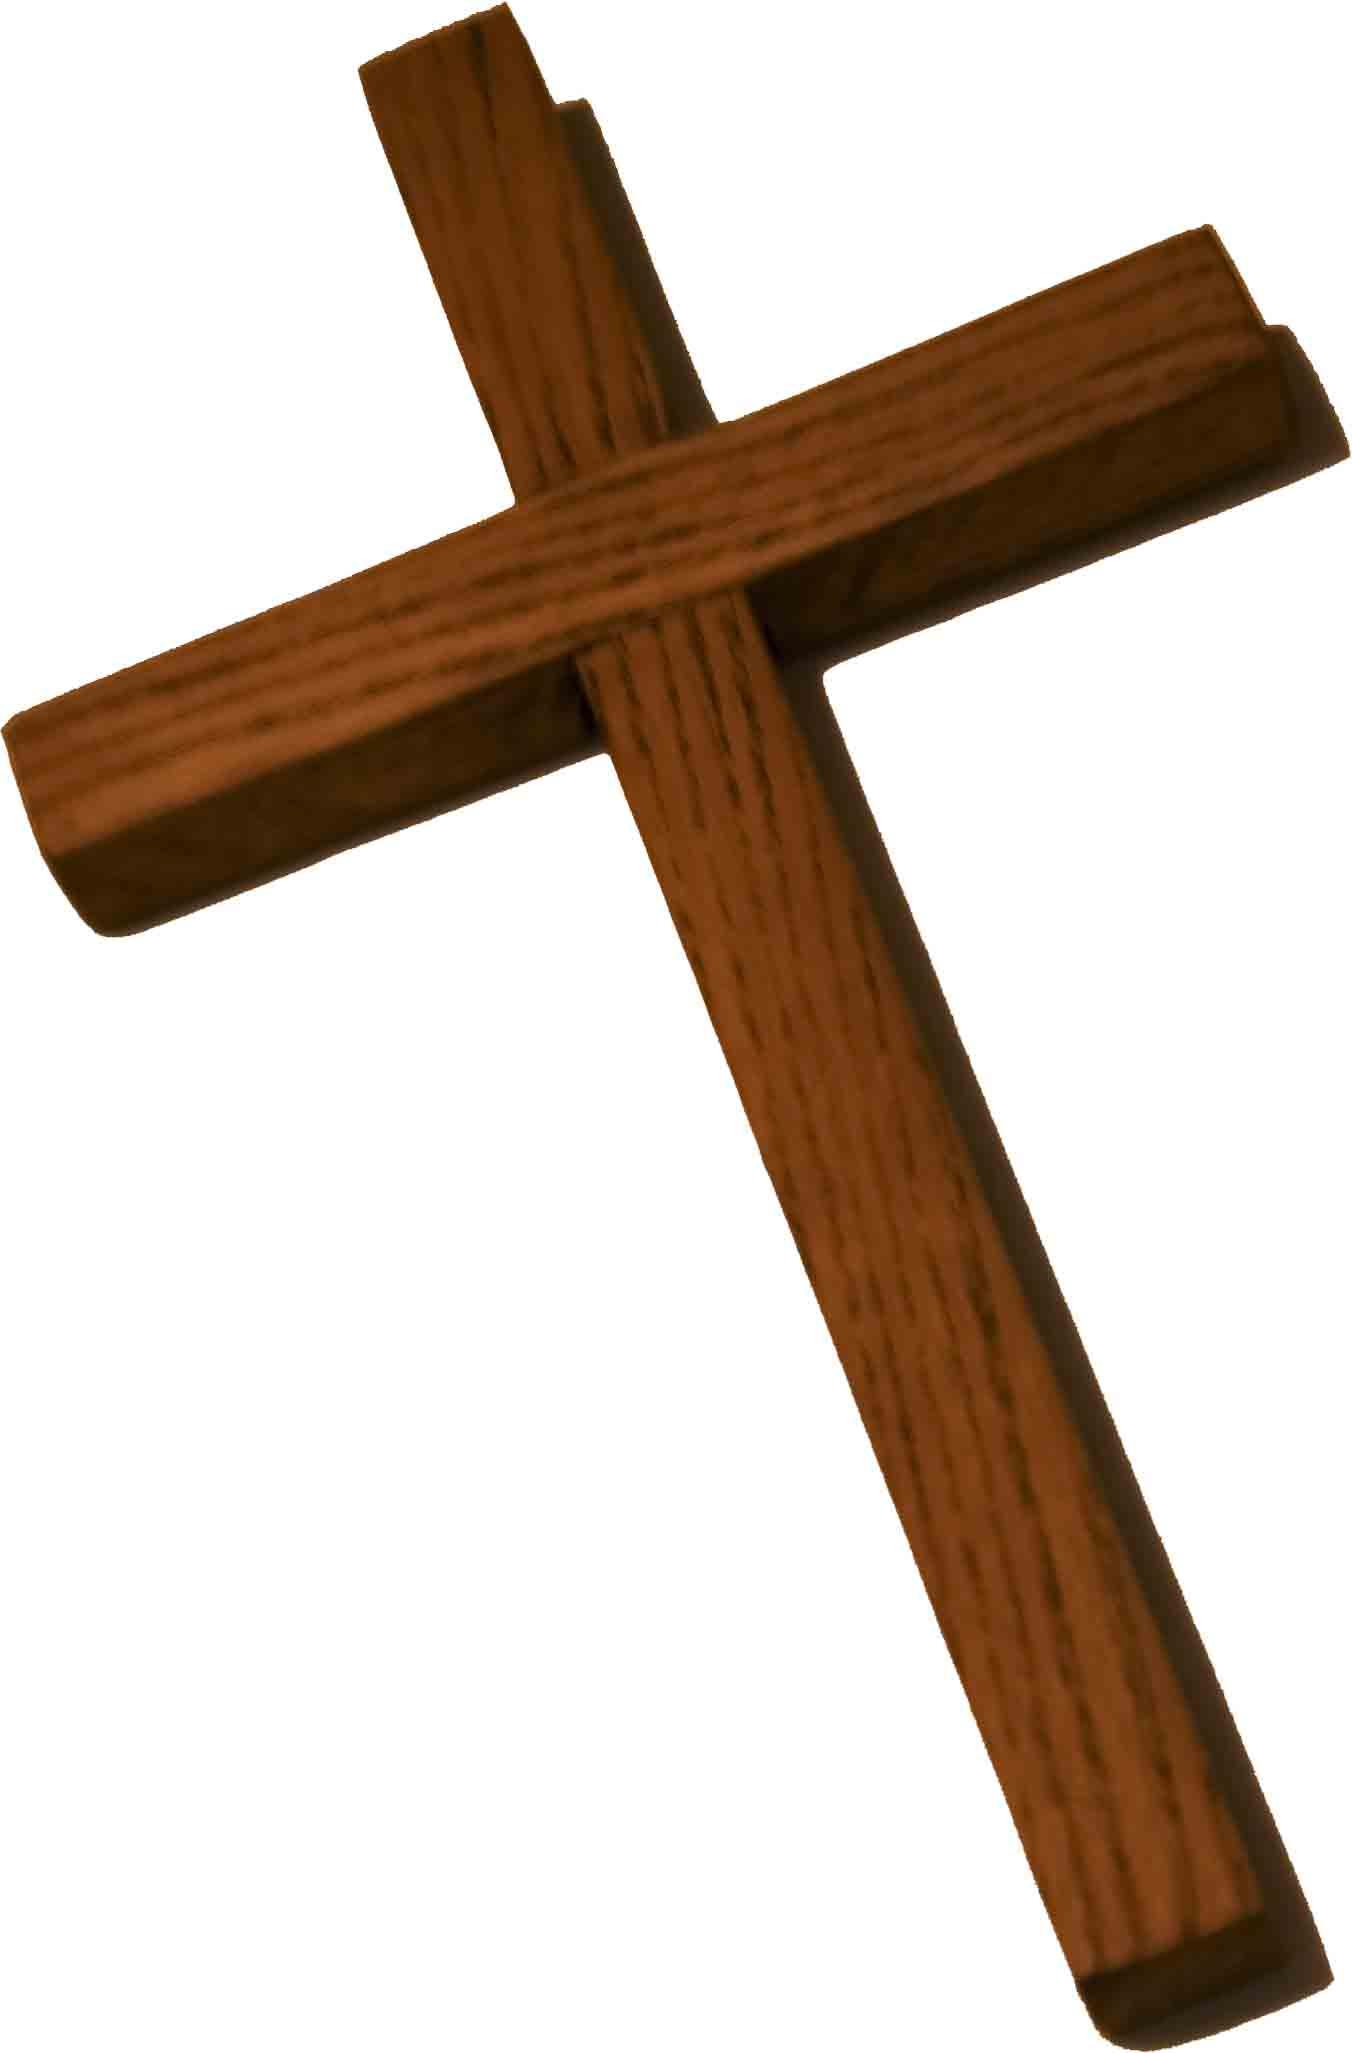 Christian Easter Scene, Saviour's Cross On Dramatic Sunrise Scene,..  Royalty Free Cliparts, Vectors, And Stock Illustration. Image 75204255.